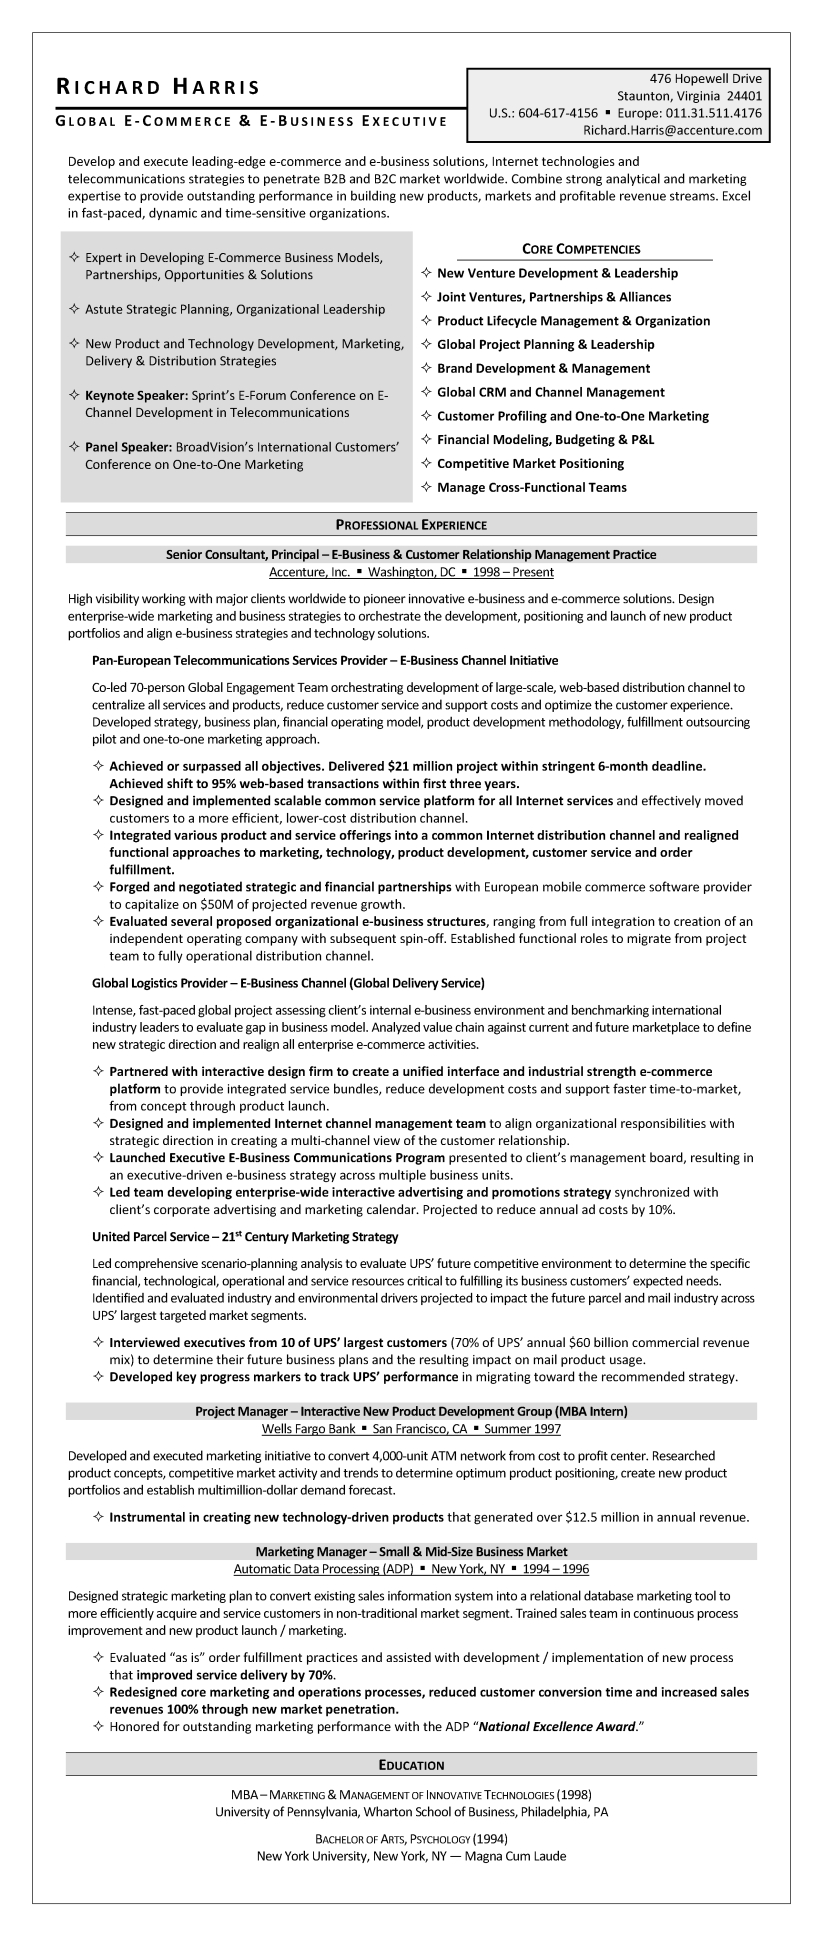 Sample Resume Global E Commerce E Business Executive Certified